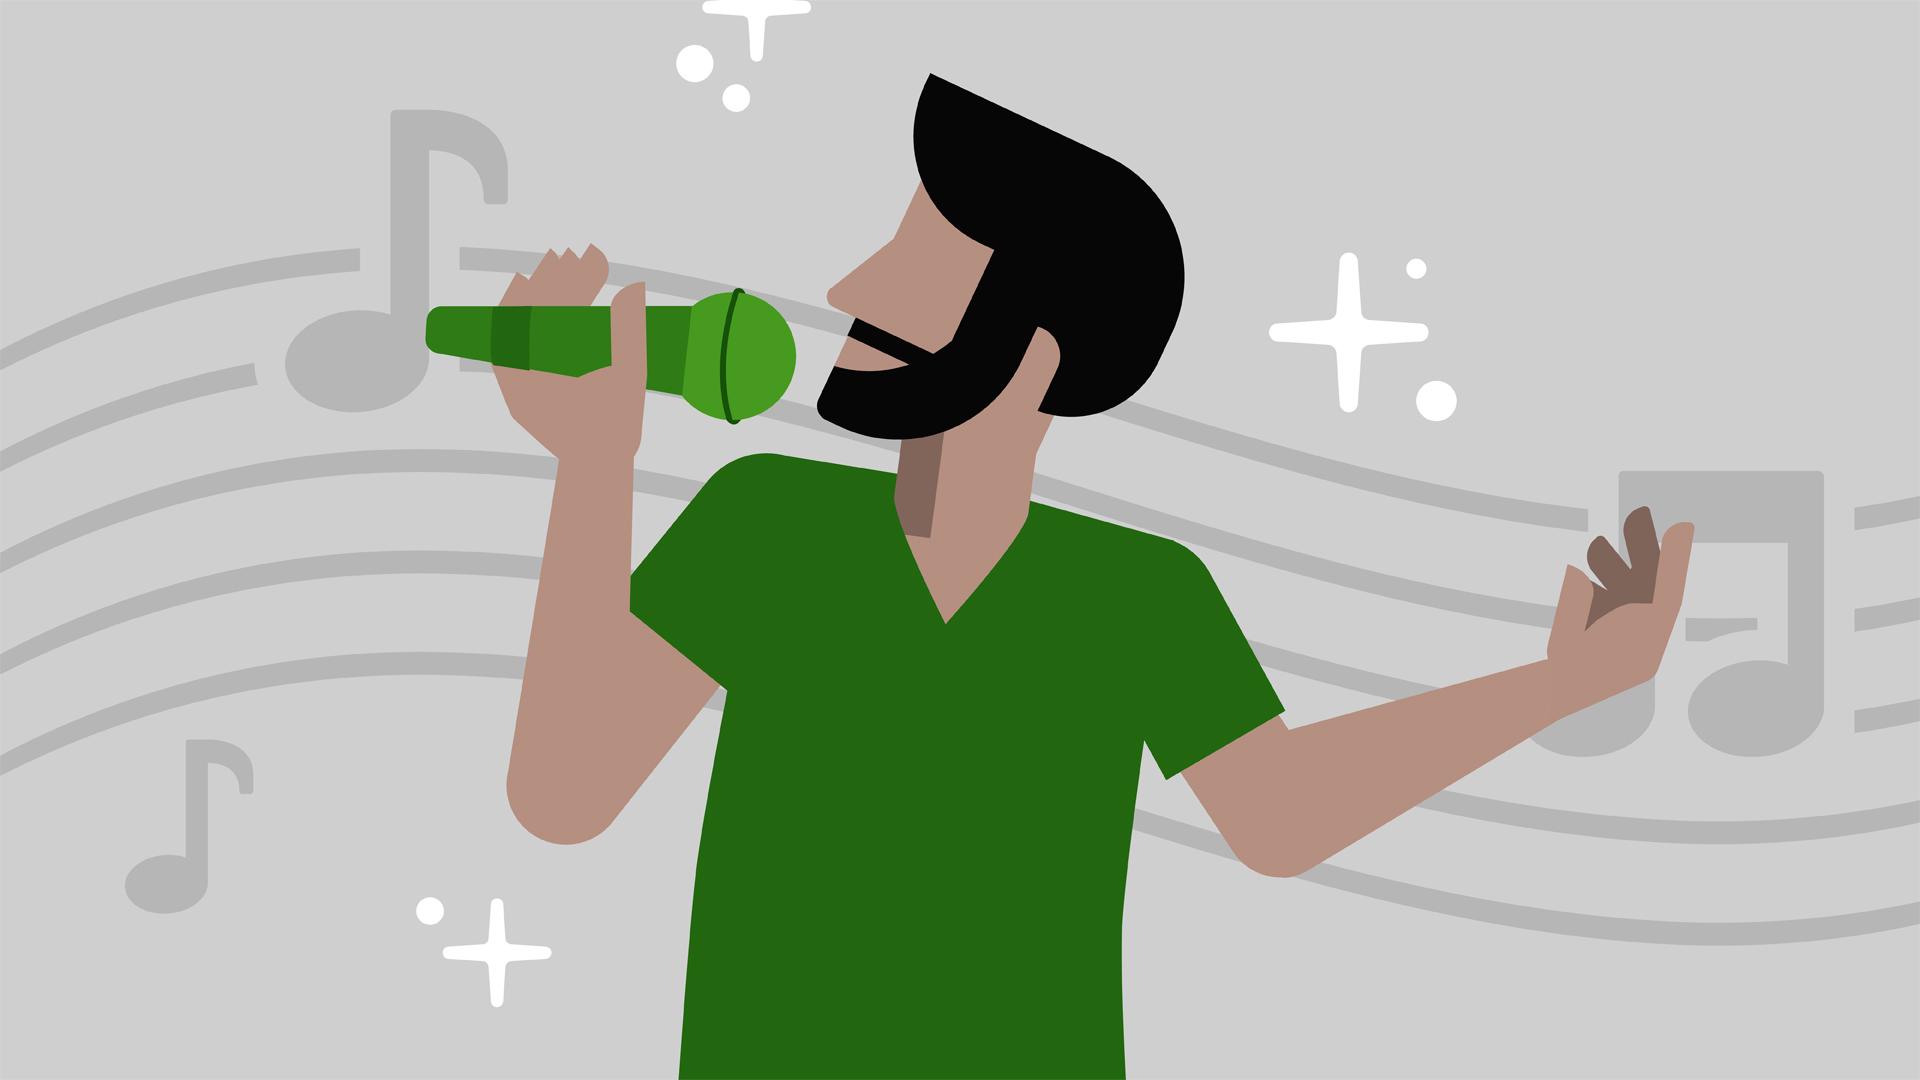 Singing harmony: Part 1